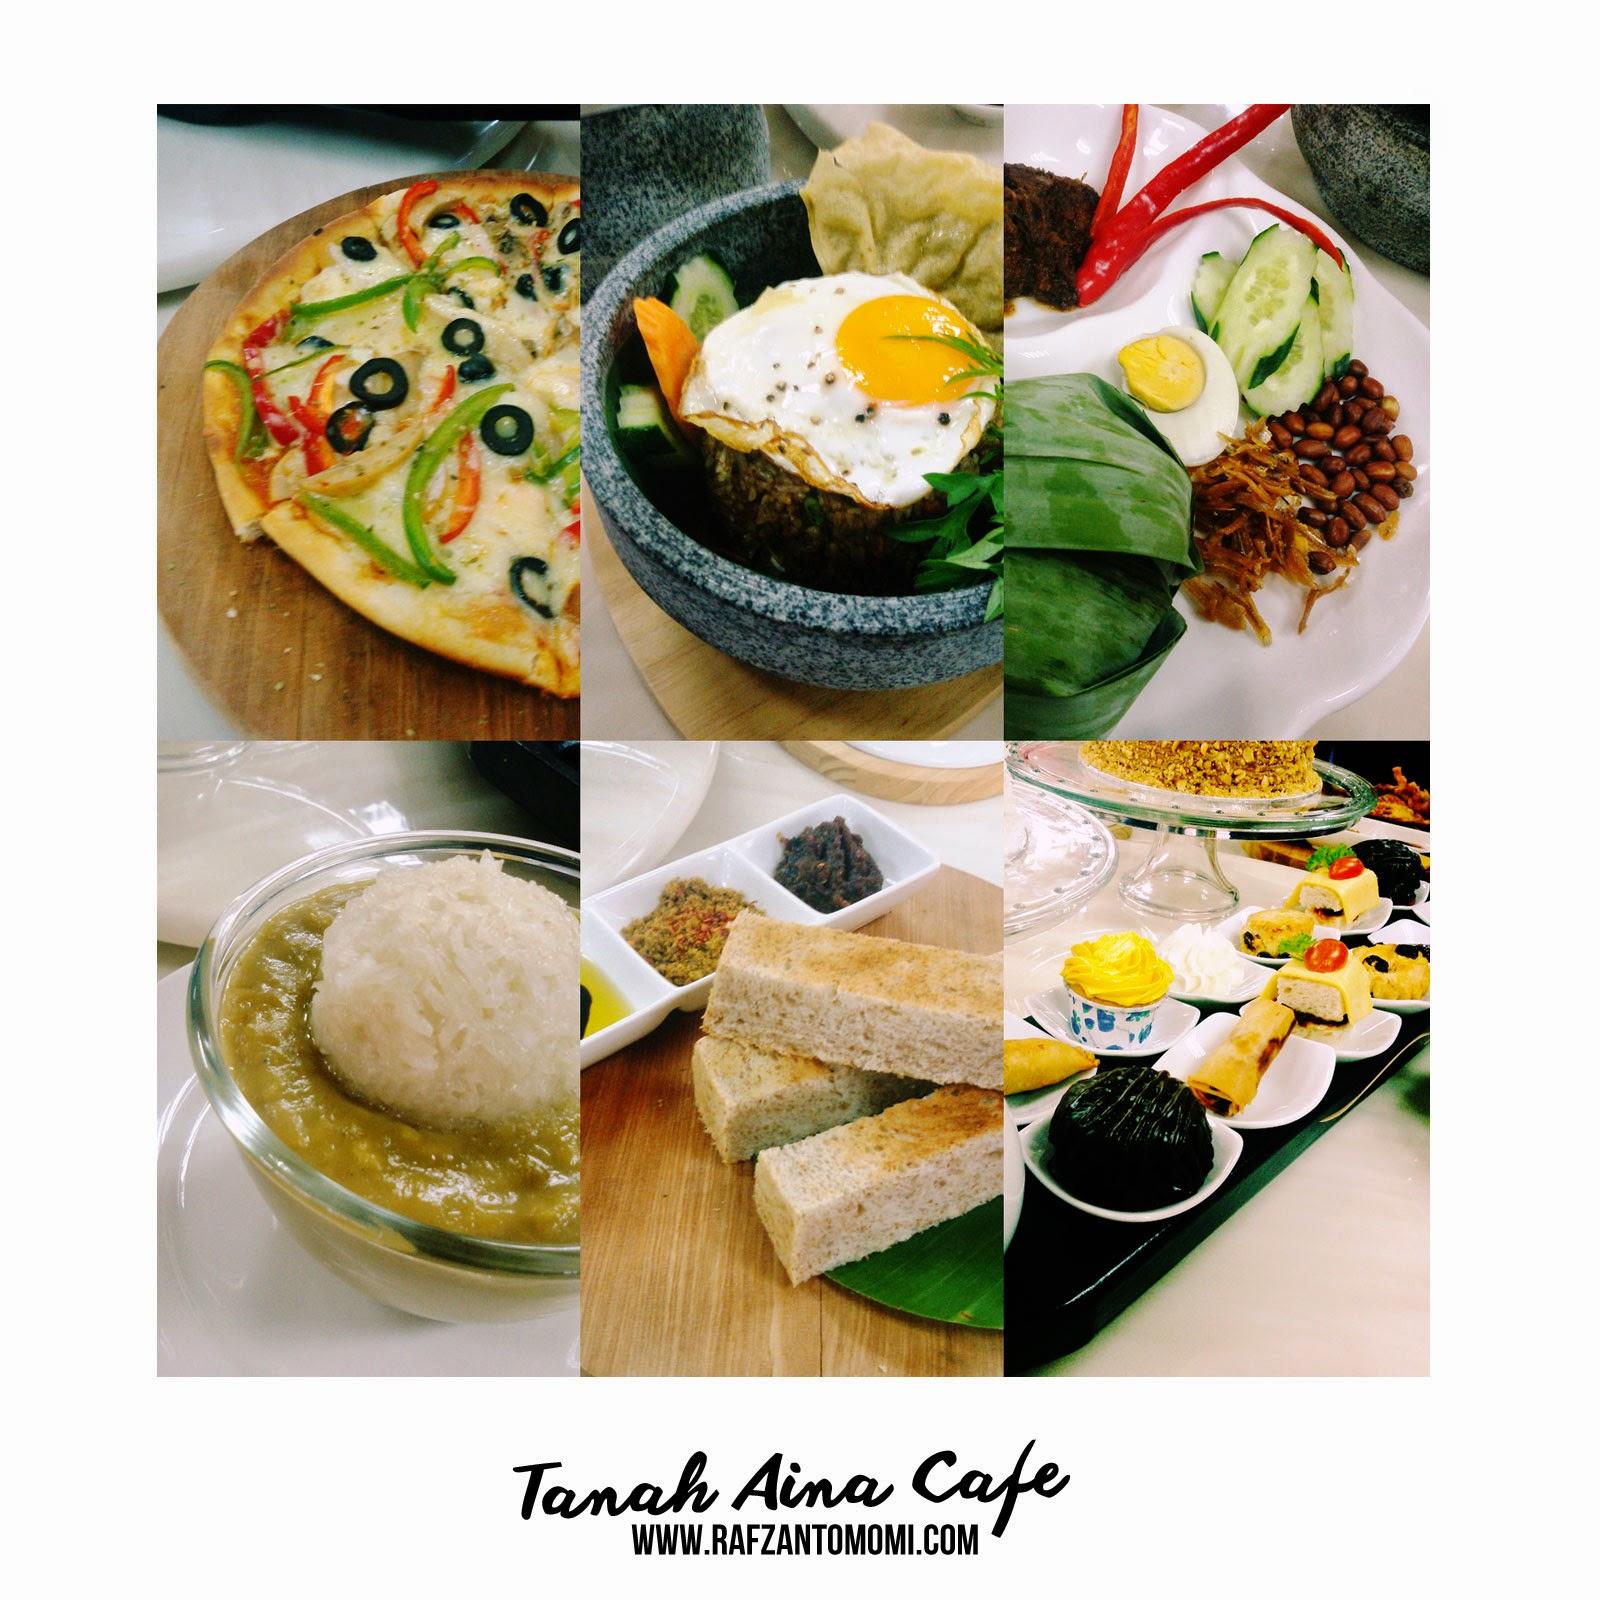 SiarSiar Tanah Aina Cafe Shah Alam My 1st Blogger Gathering